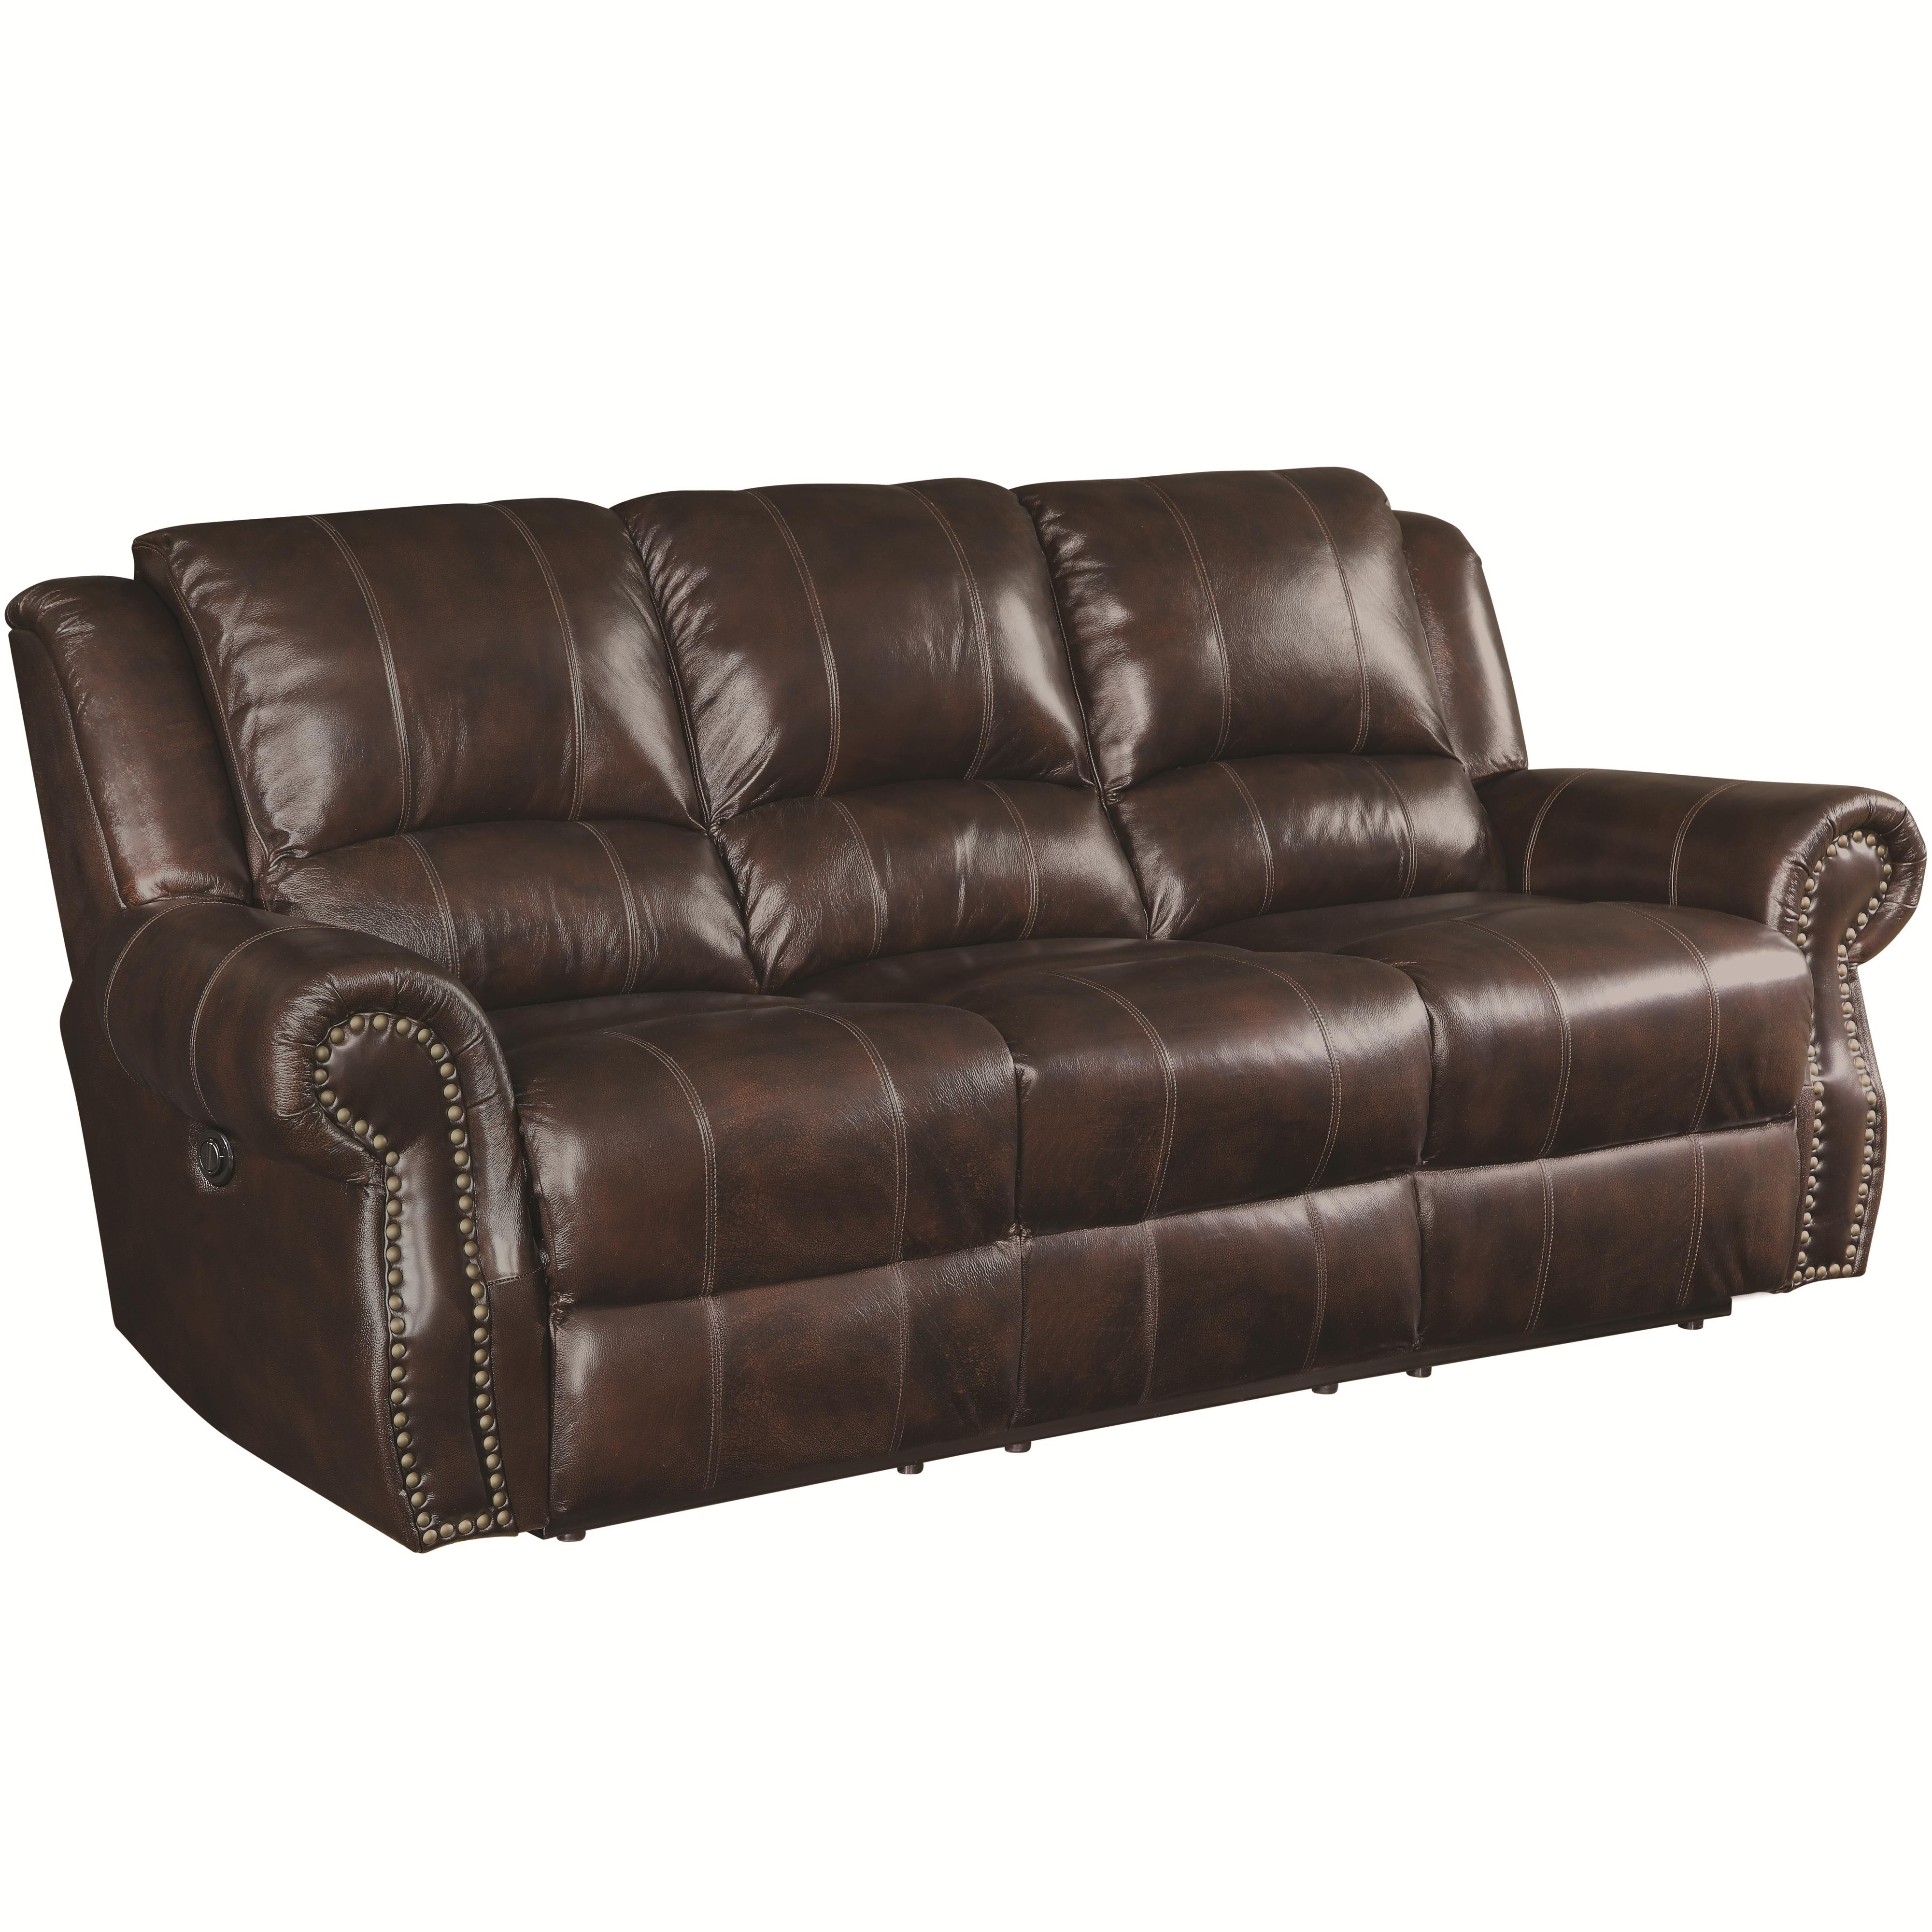 Coaster Sir Rawlinson 650161 Traditional Reclining Sofa